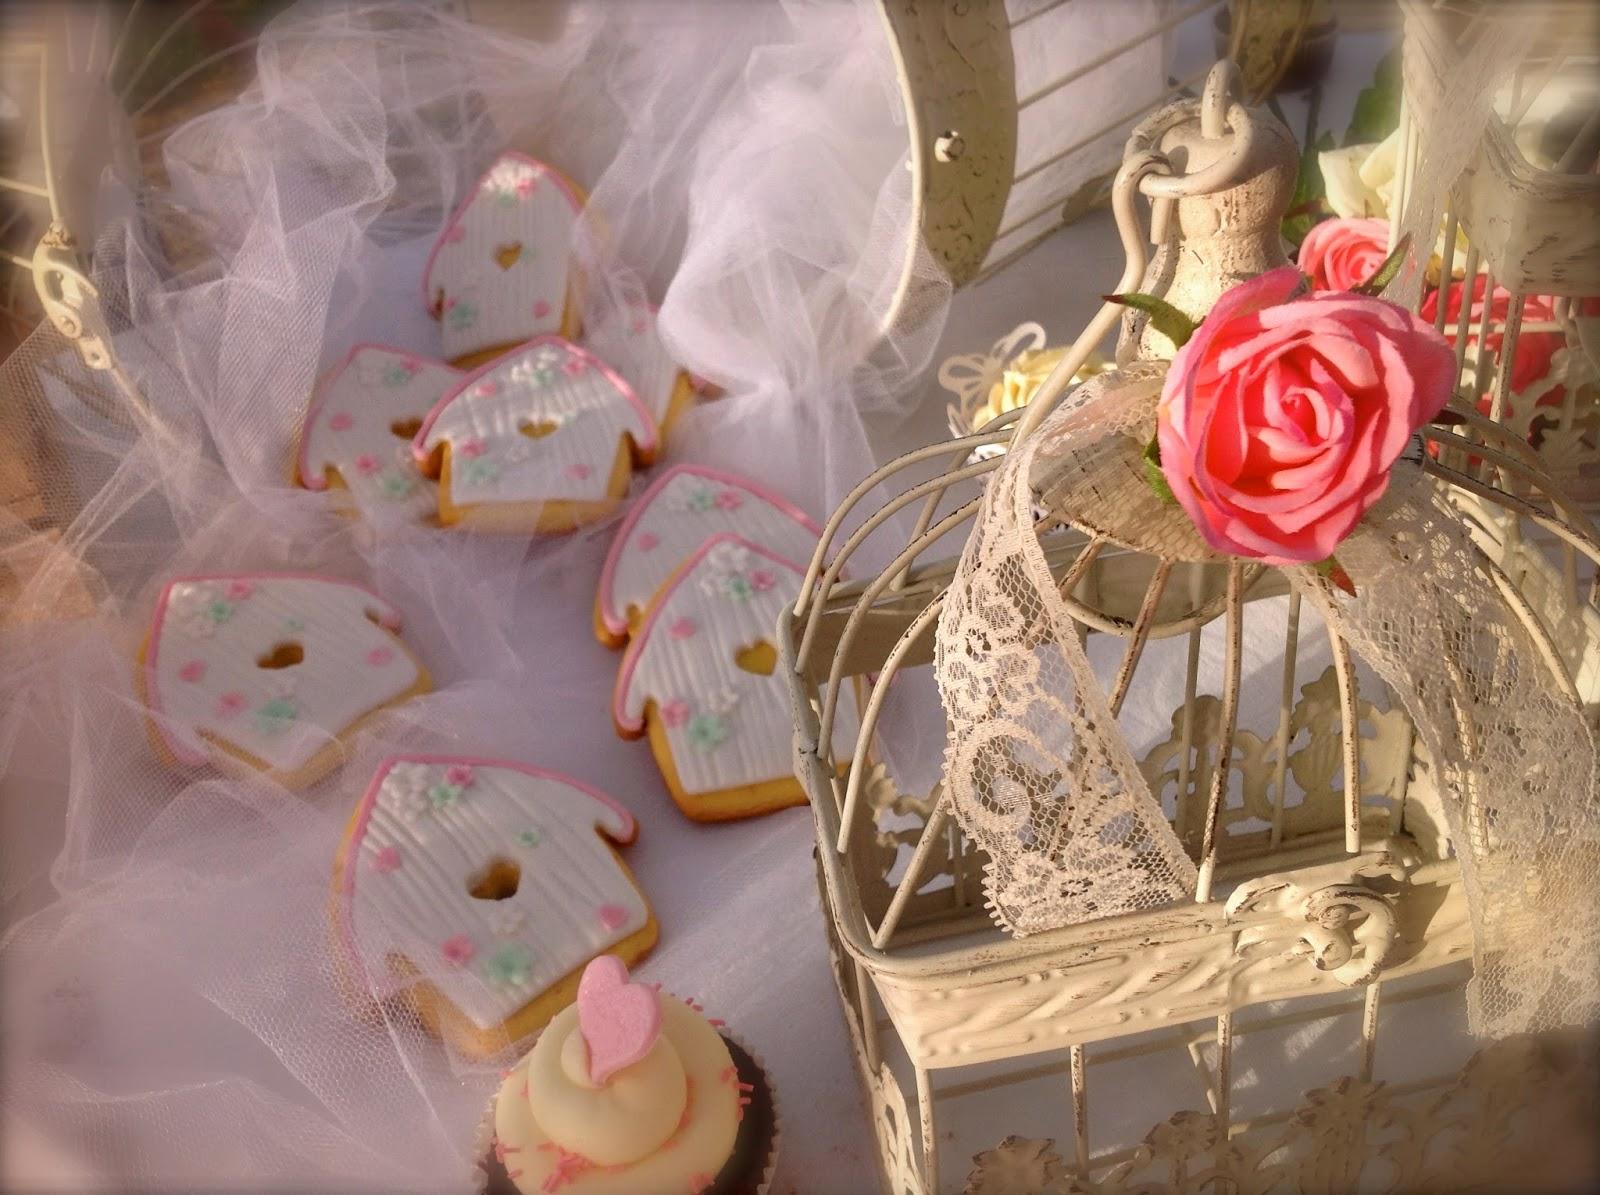 Le torte di monica shabby chic sweet table for Arredamento shabby chic napoli